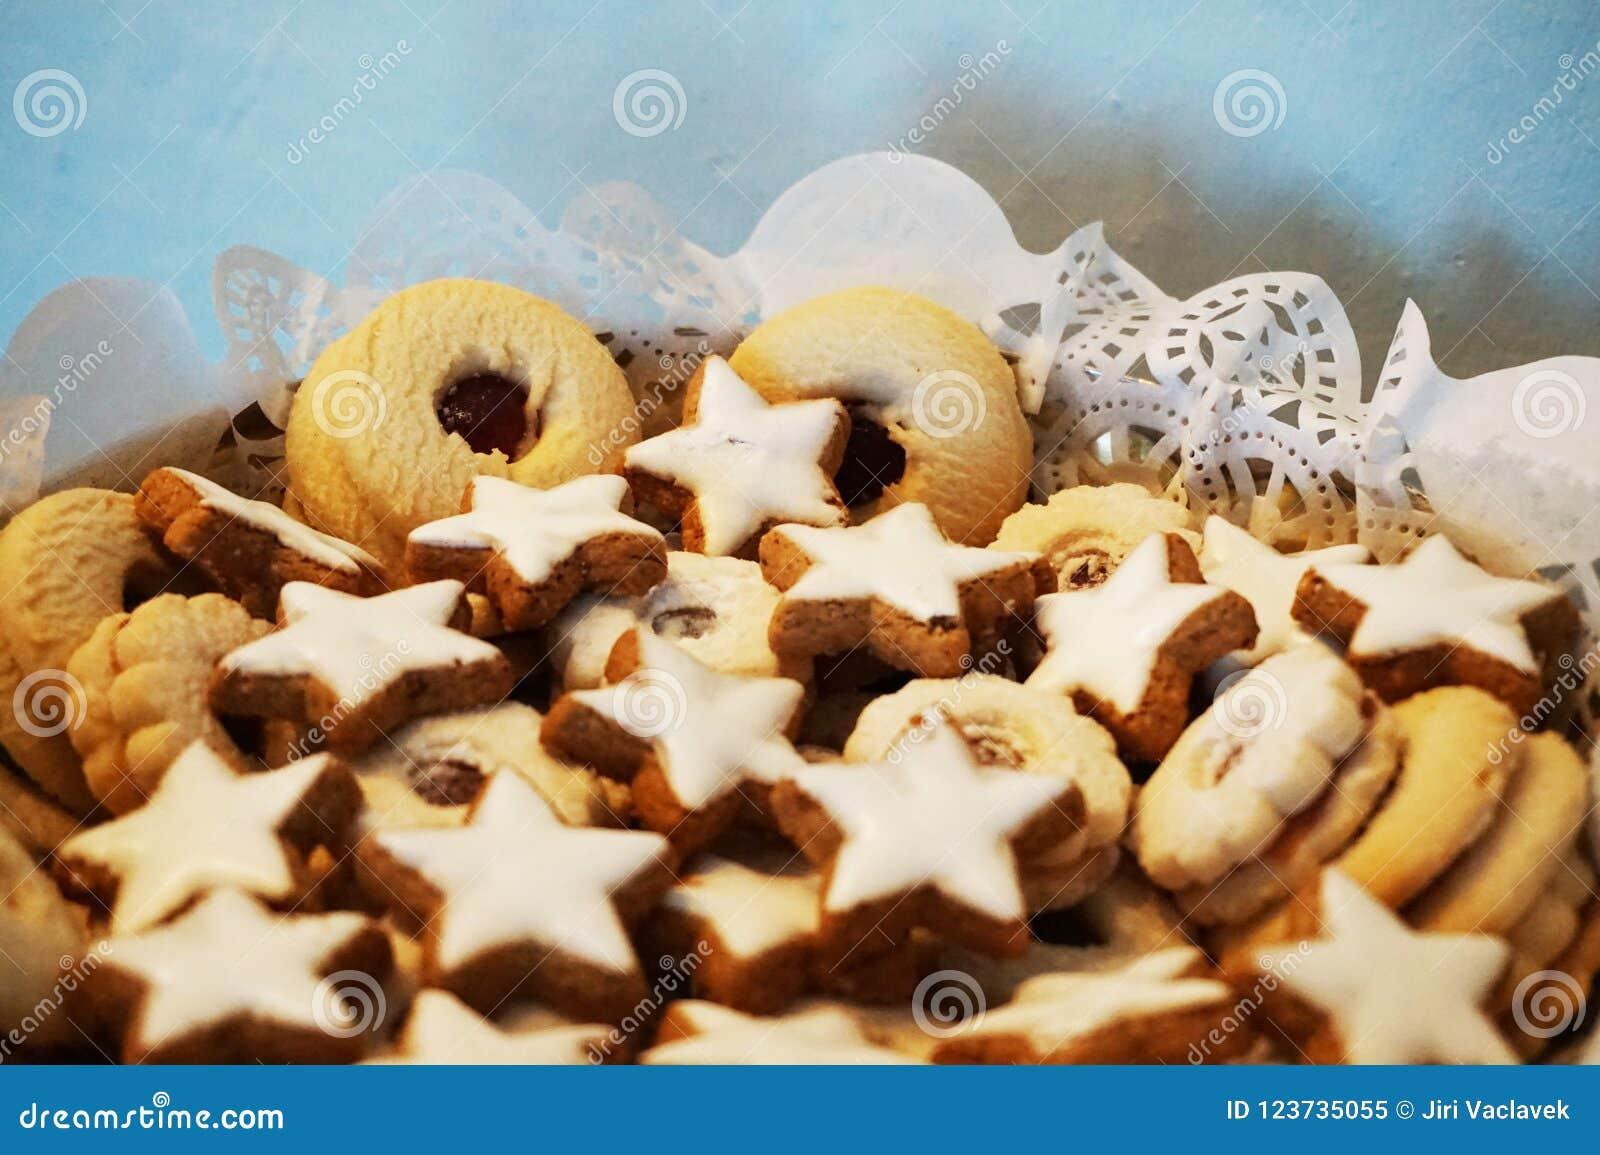 Czech Christmas Cookies Stock Image Image Of Brown 123735055